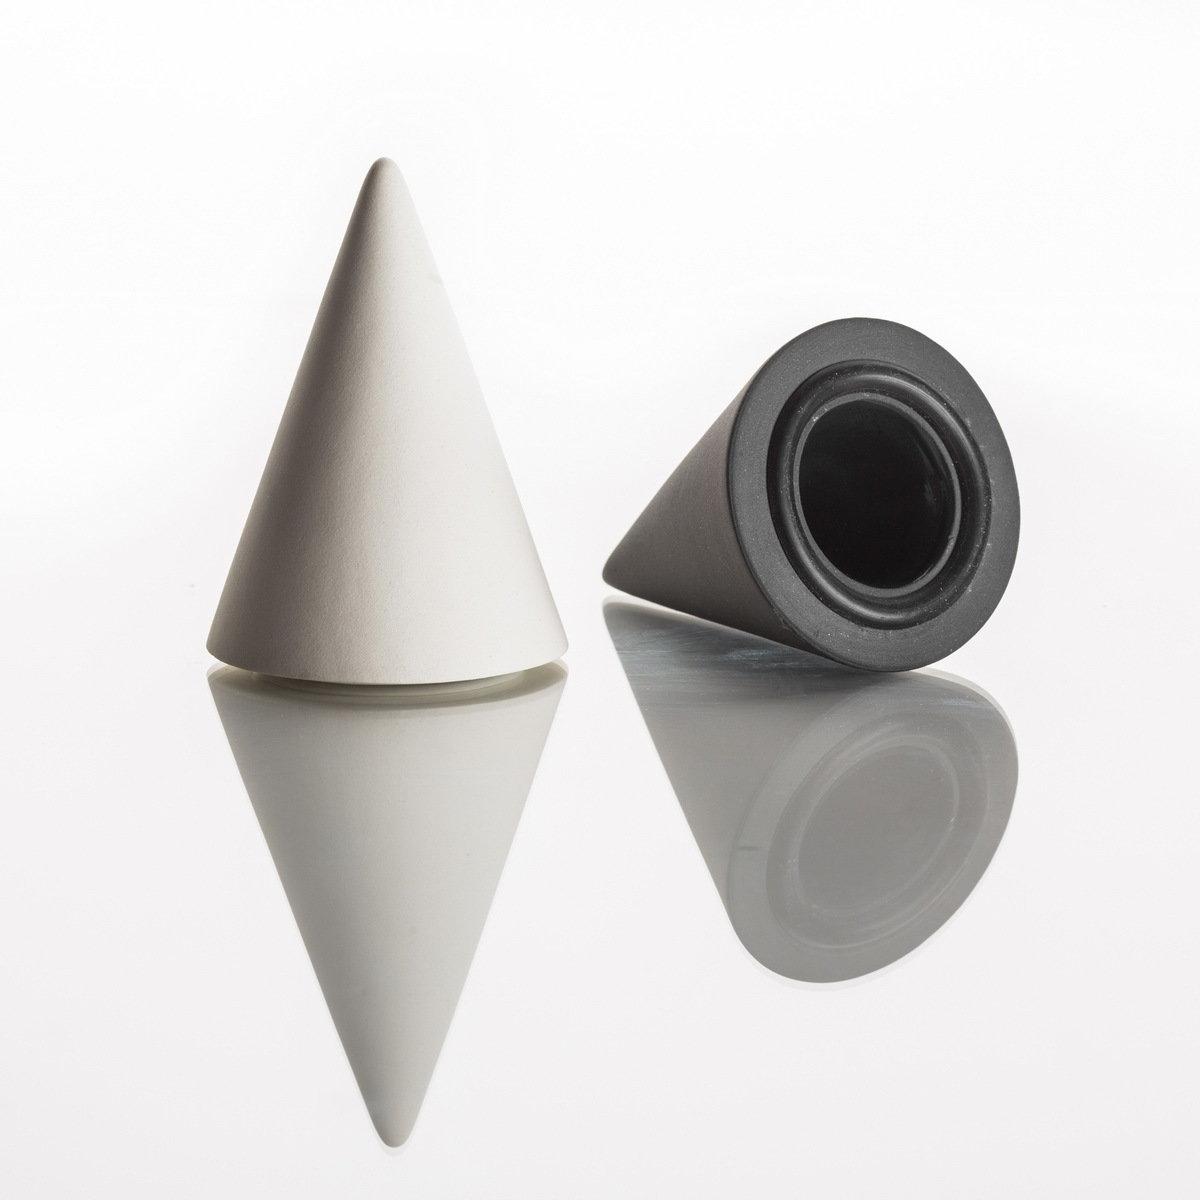 Pfeffer- oder Salzstreuer aus hochwertigem Porzellan